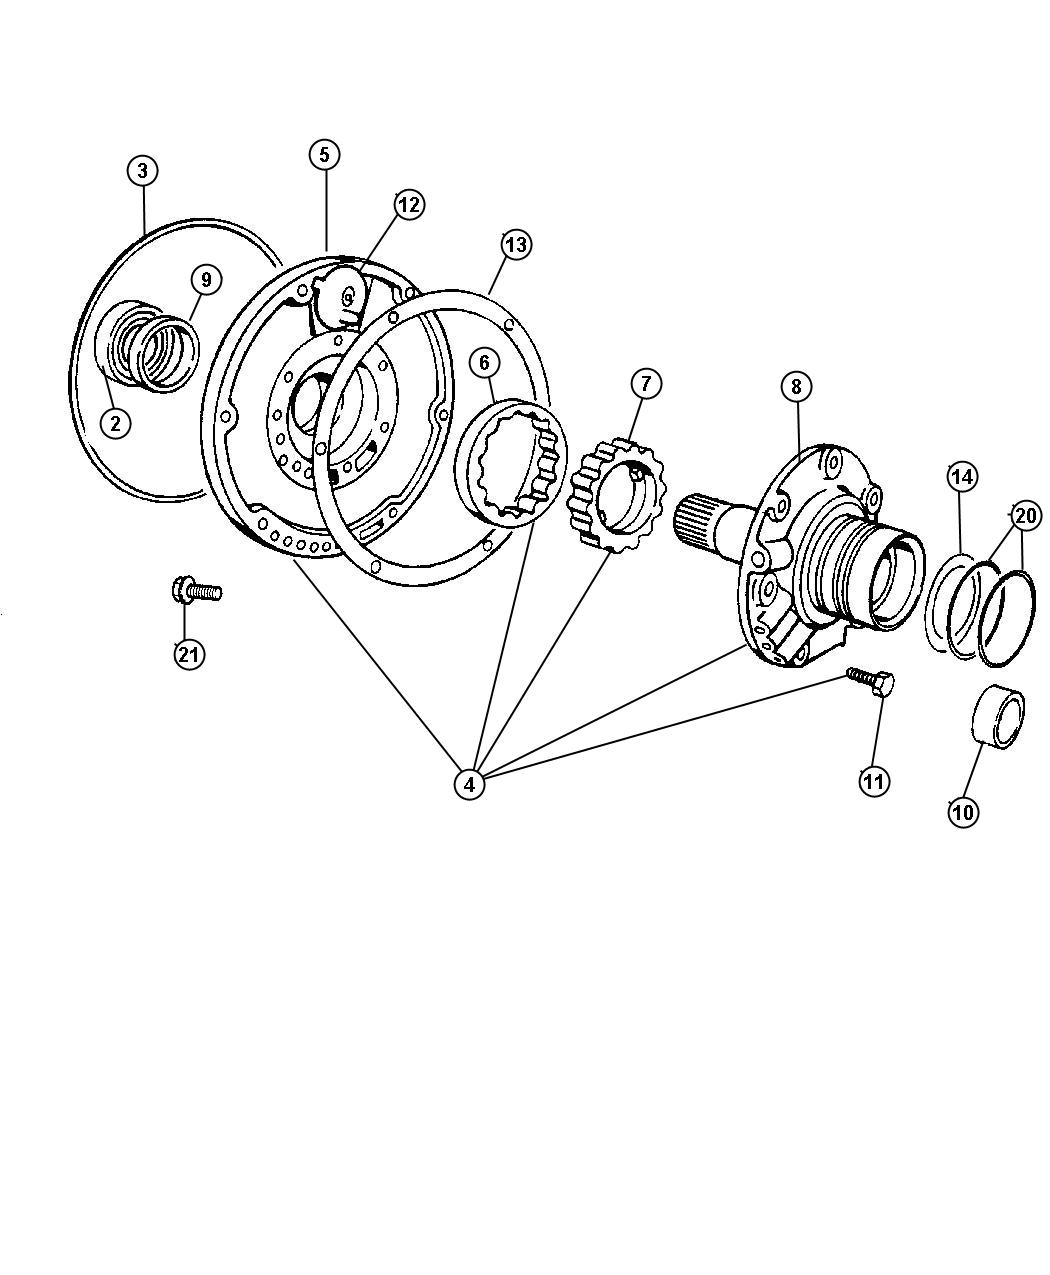 Dodge Ram 2500 Pump package. Transmission. W/bgj, w/obgj